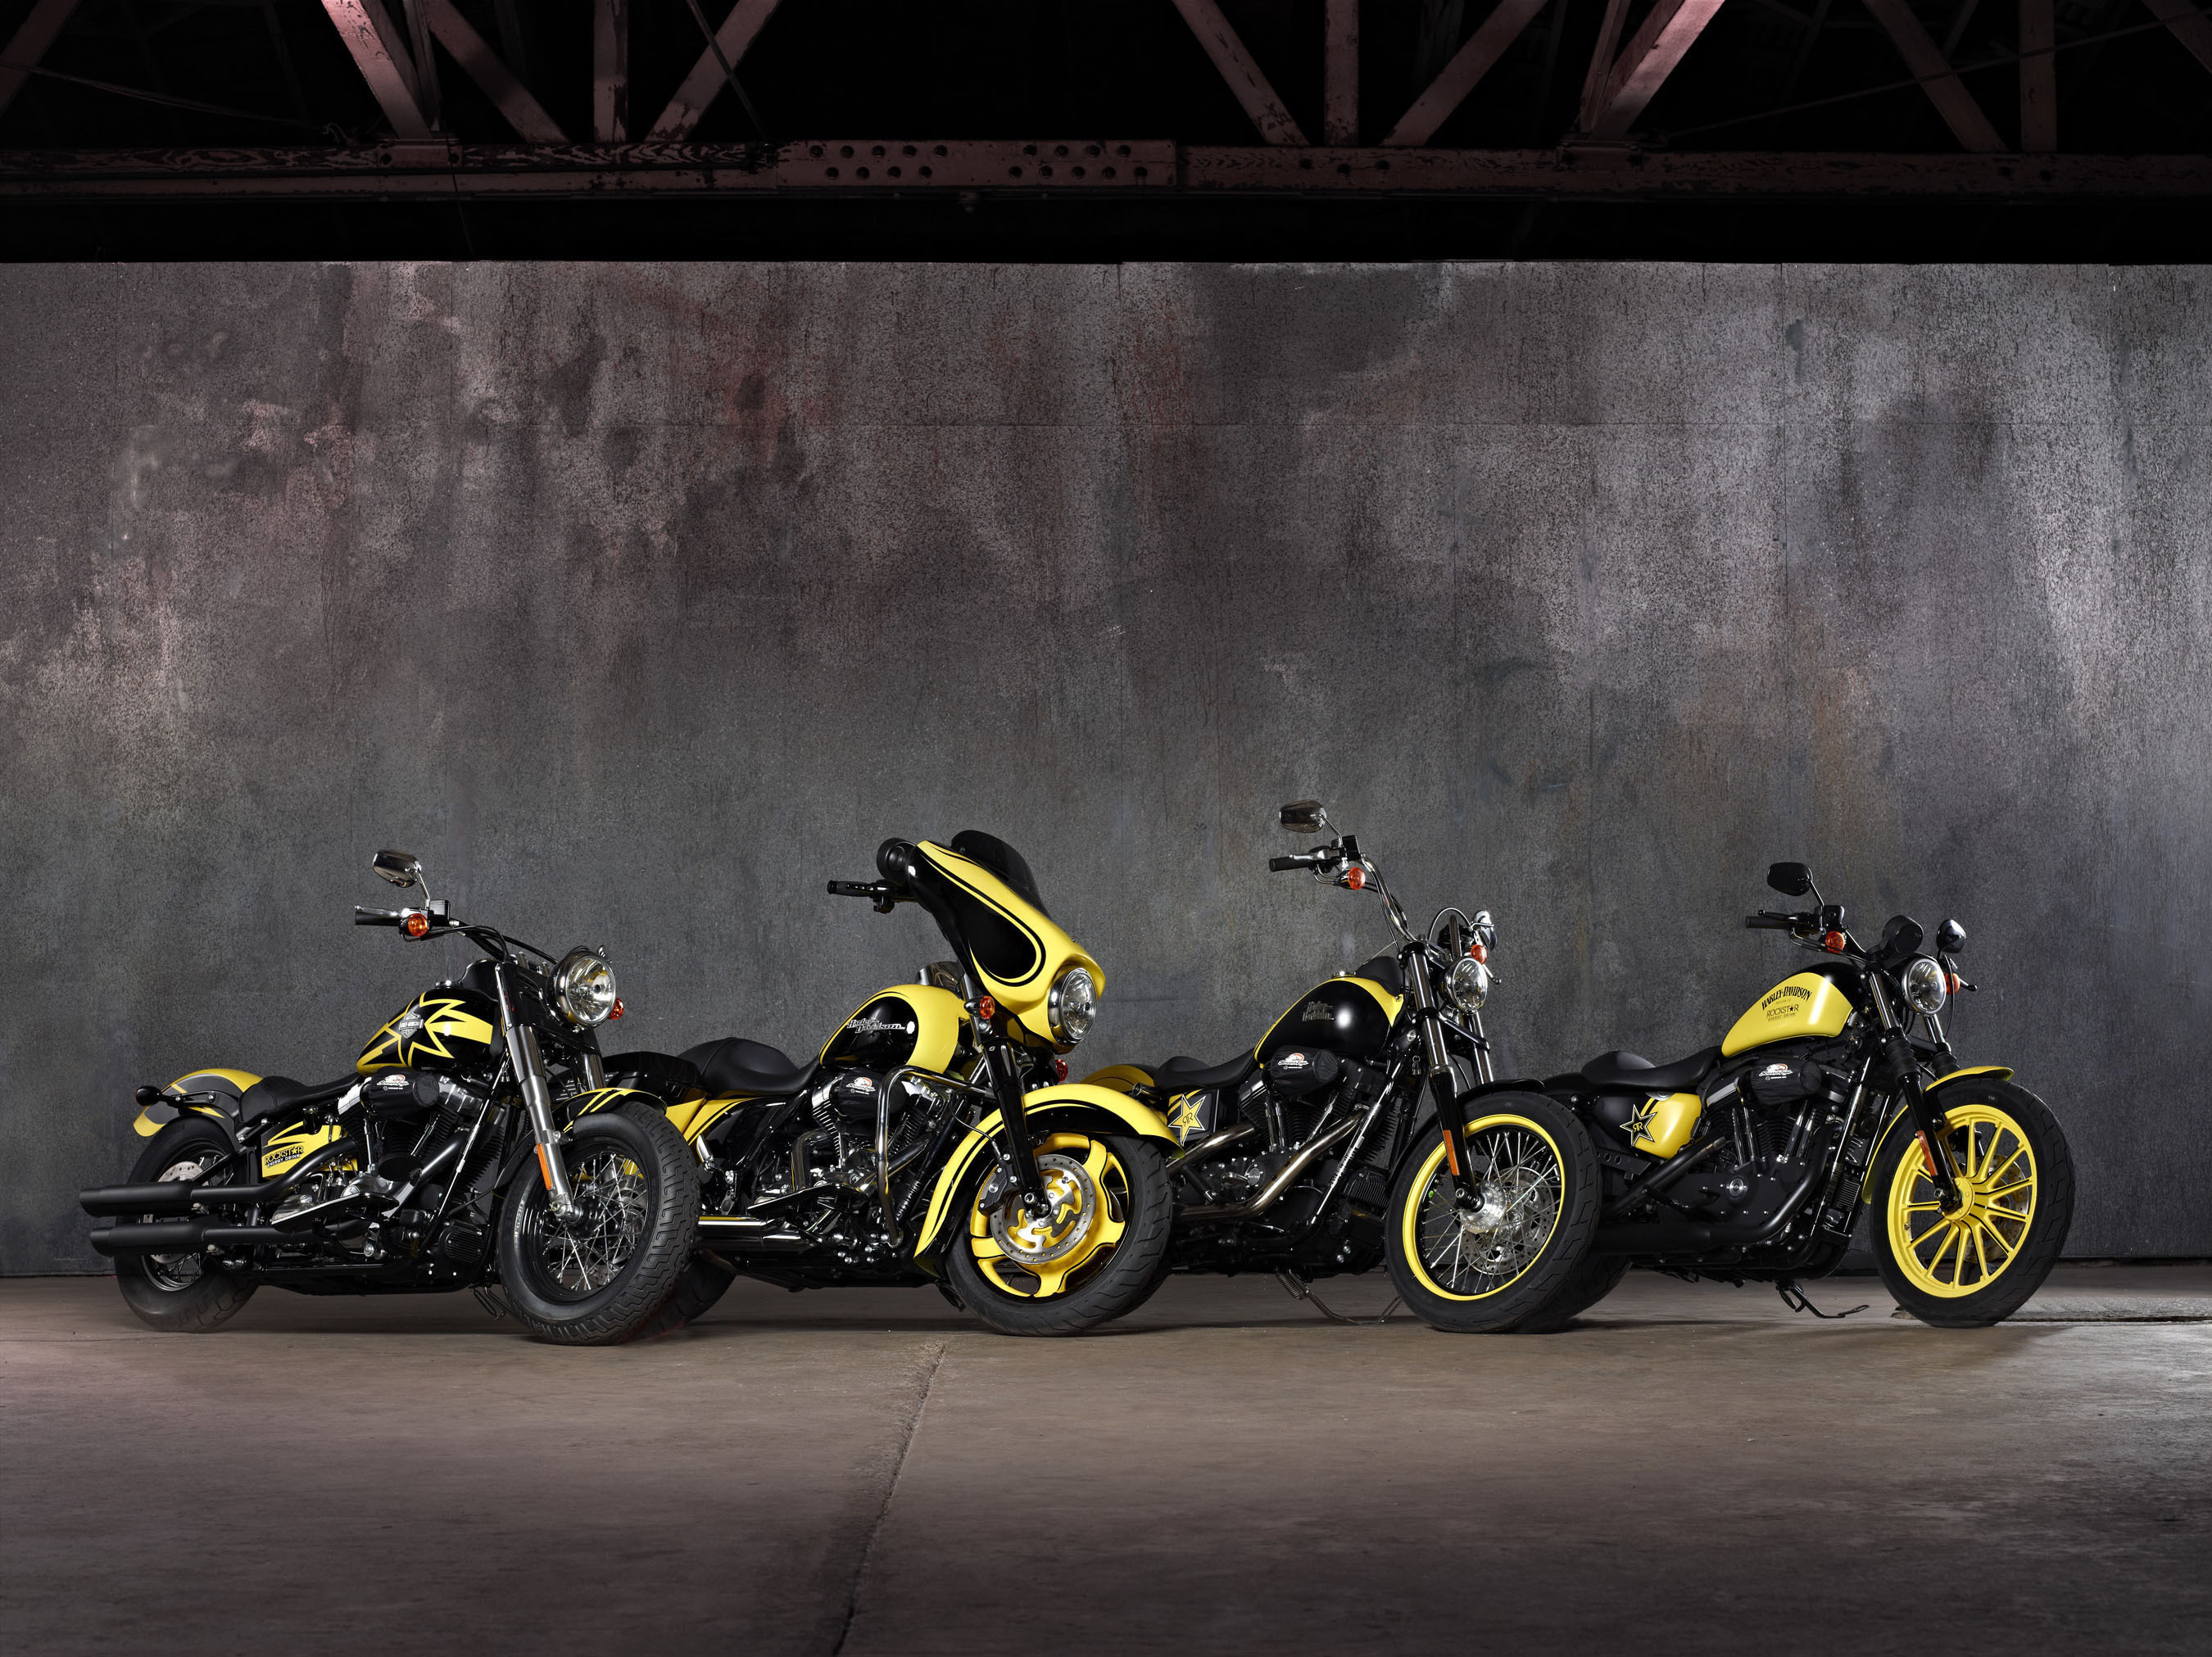 HARLEY-DAVIDSON TAKES STAGE WITH ROCKSTAR ENERGY DRINK.  (PRNewsFoto/Harley-Davidson)